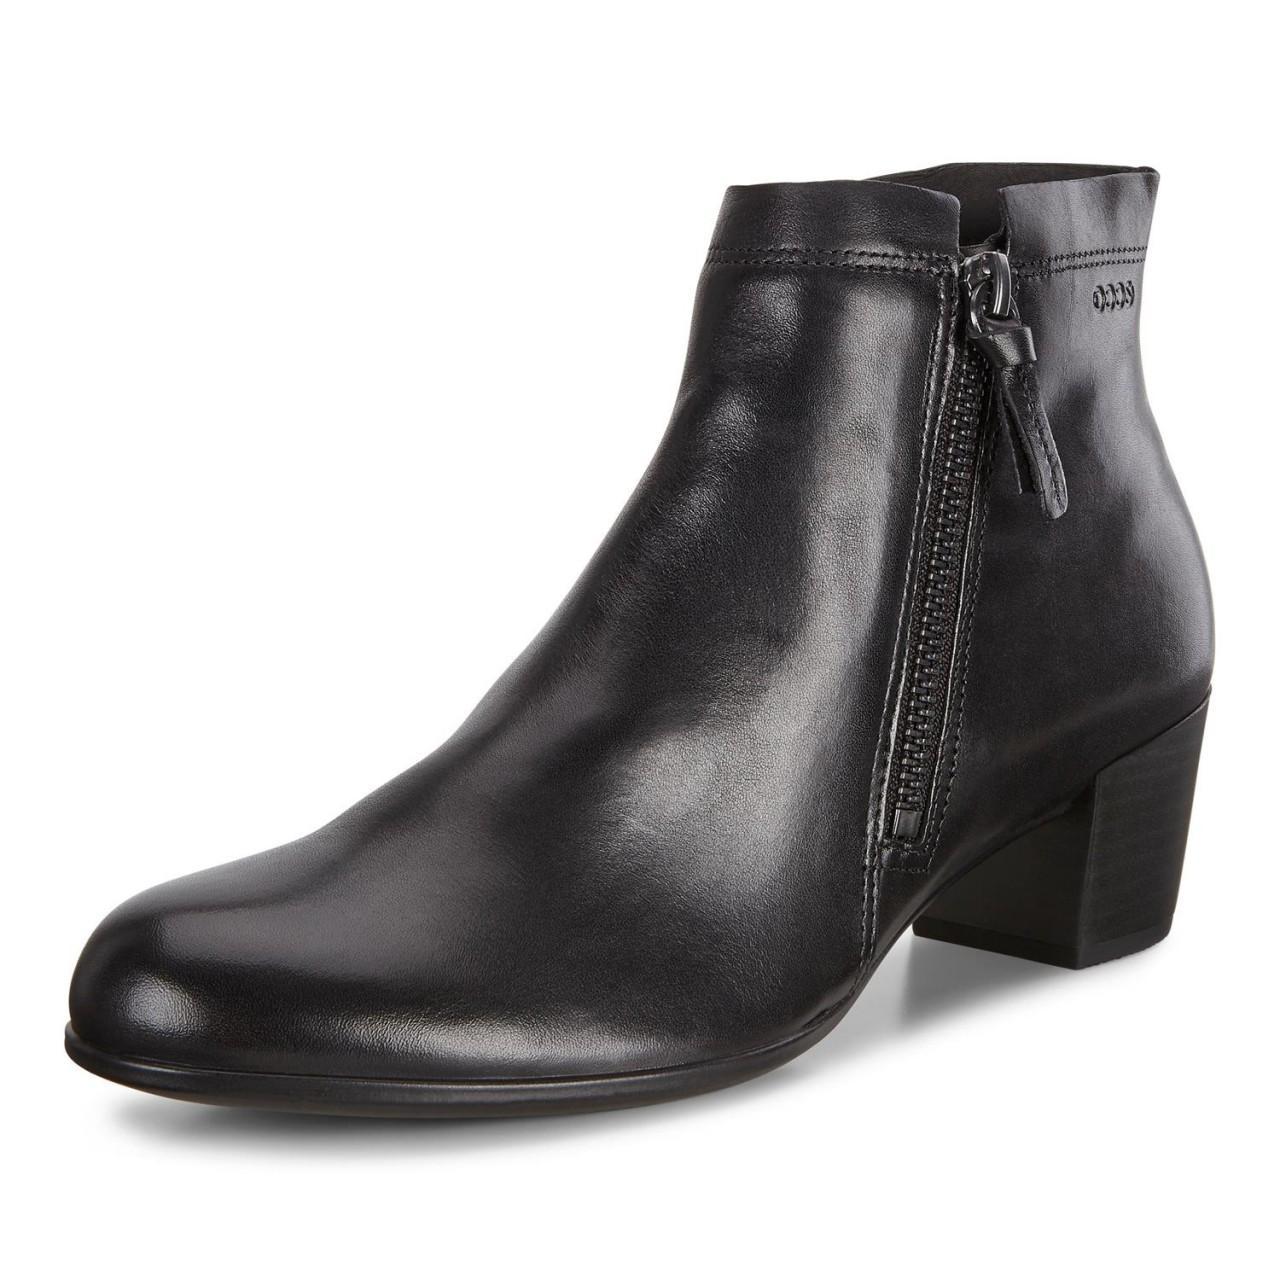 a13feba652d138 Ecco Wo Ankle Boots Black Shape M 35 in Black - Lyst